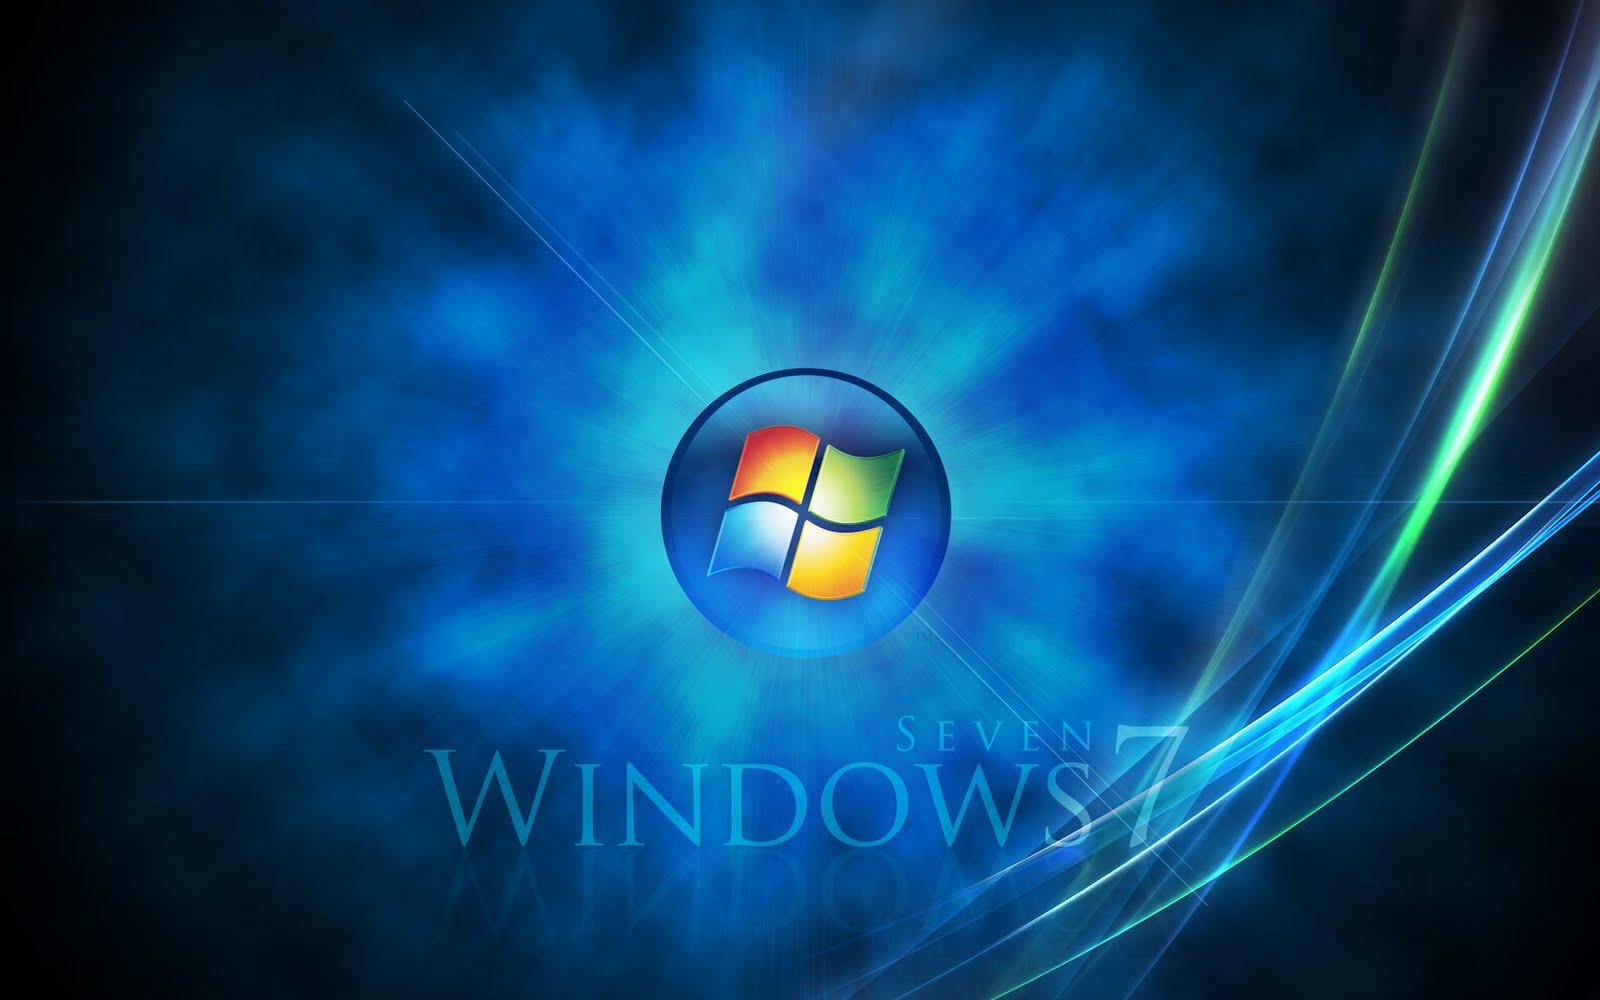 http://2.bp.blogspot.com/_Qc6aMdLT994/S6pU4OOt9EI/AAAAAAAAFGc/gynDp4qc4PI/s1600/Windows%207%20ultimate%20collection%20of%20wallpapers%20(5).jpg